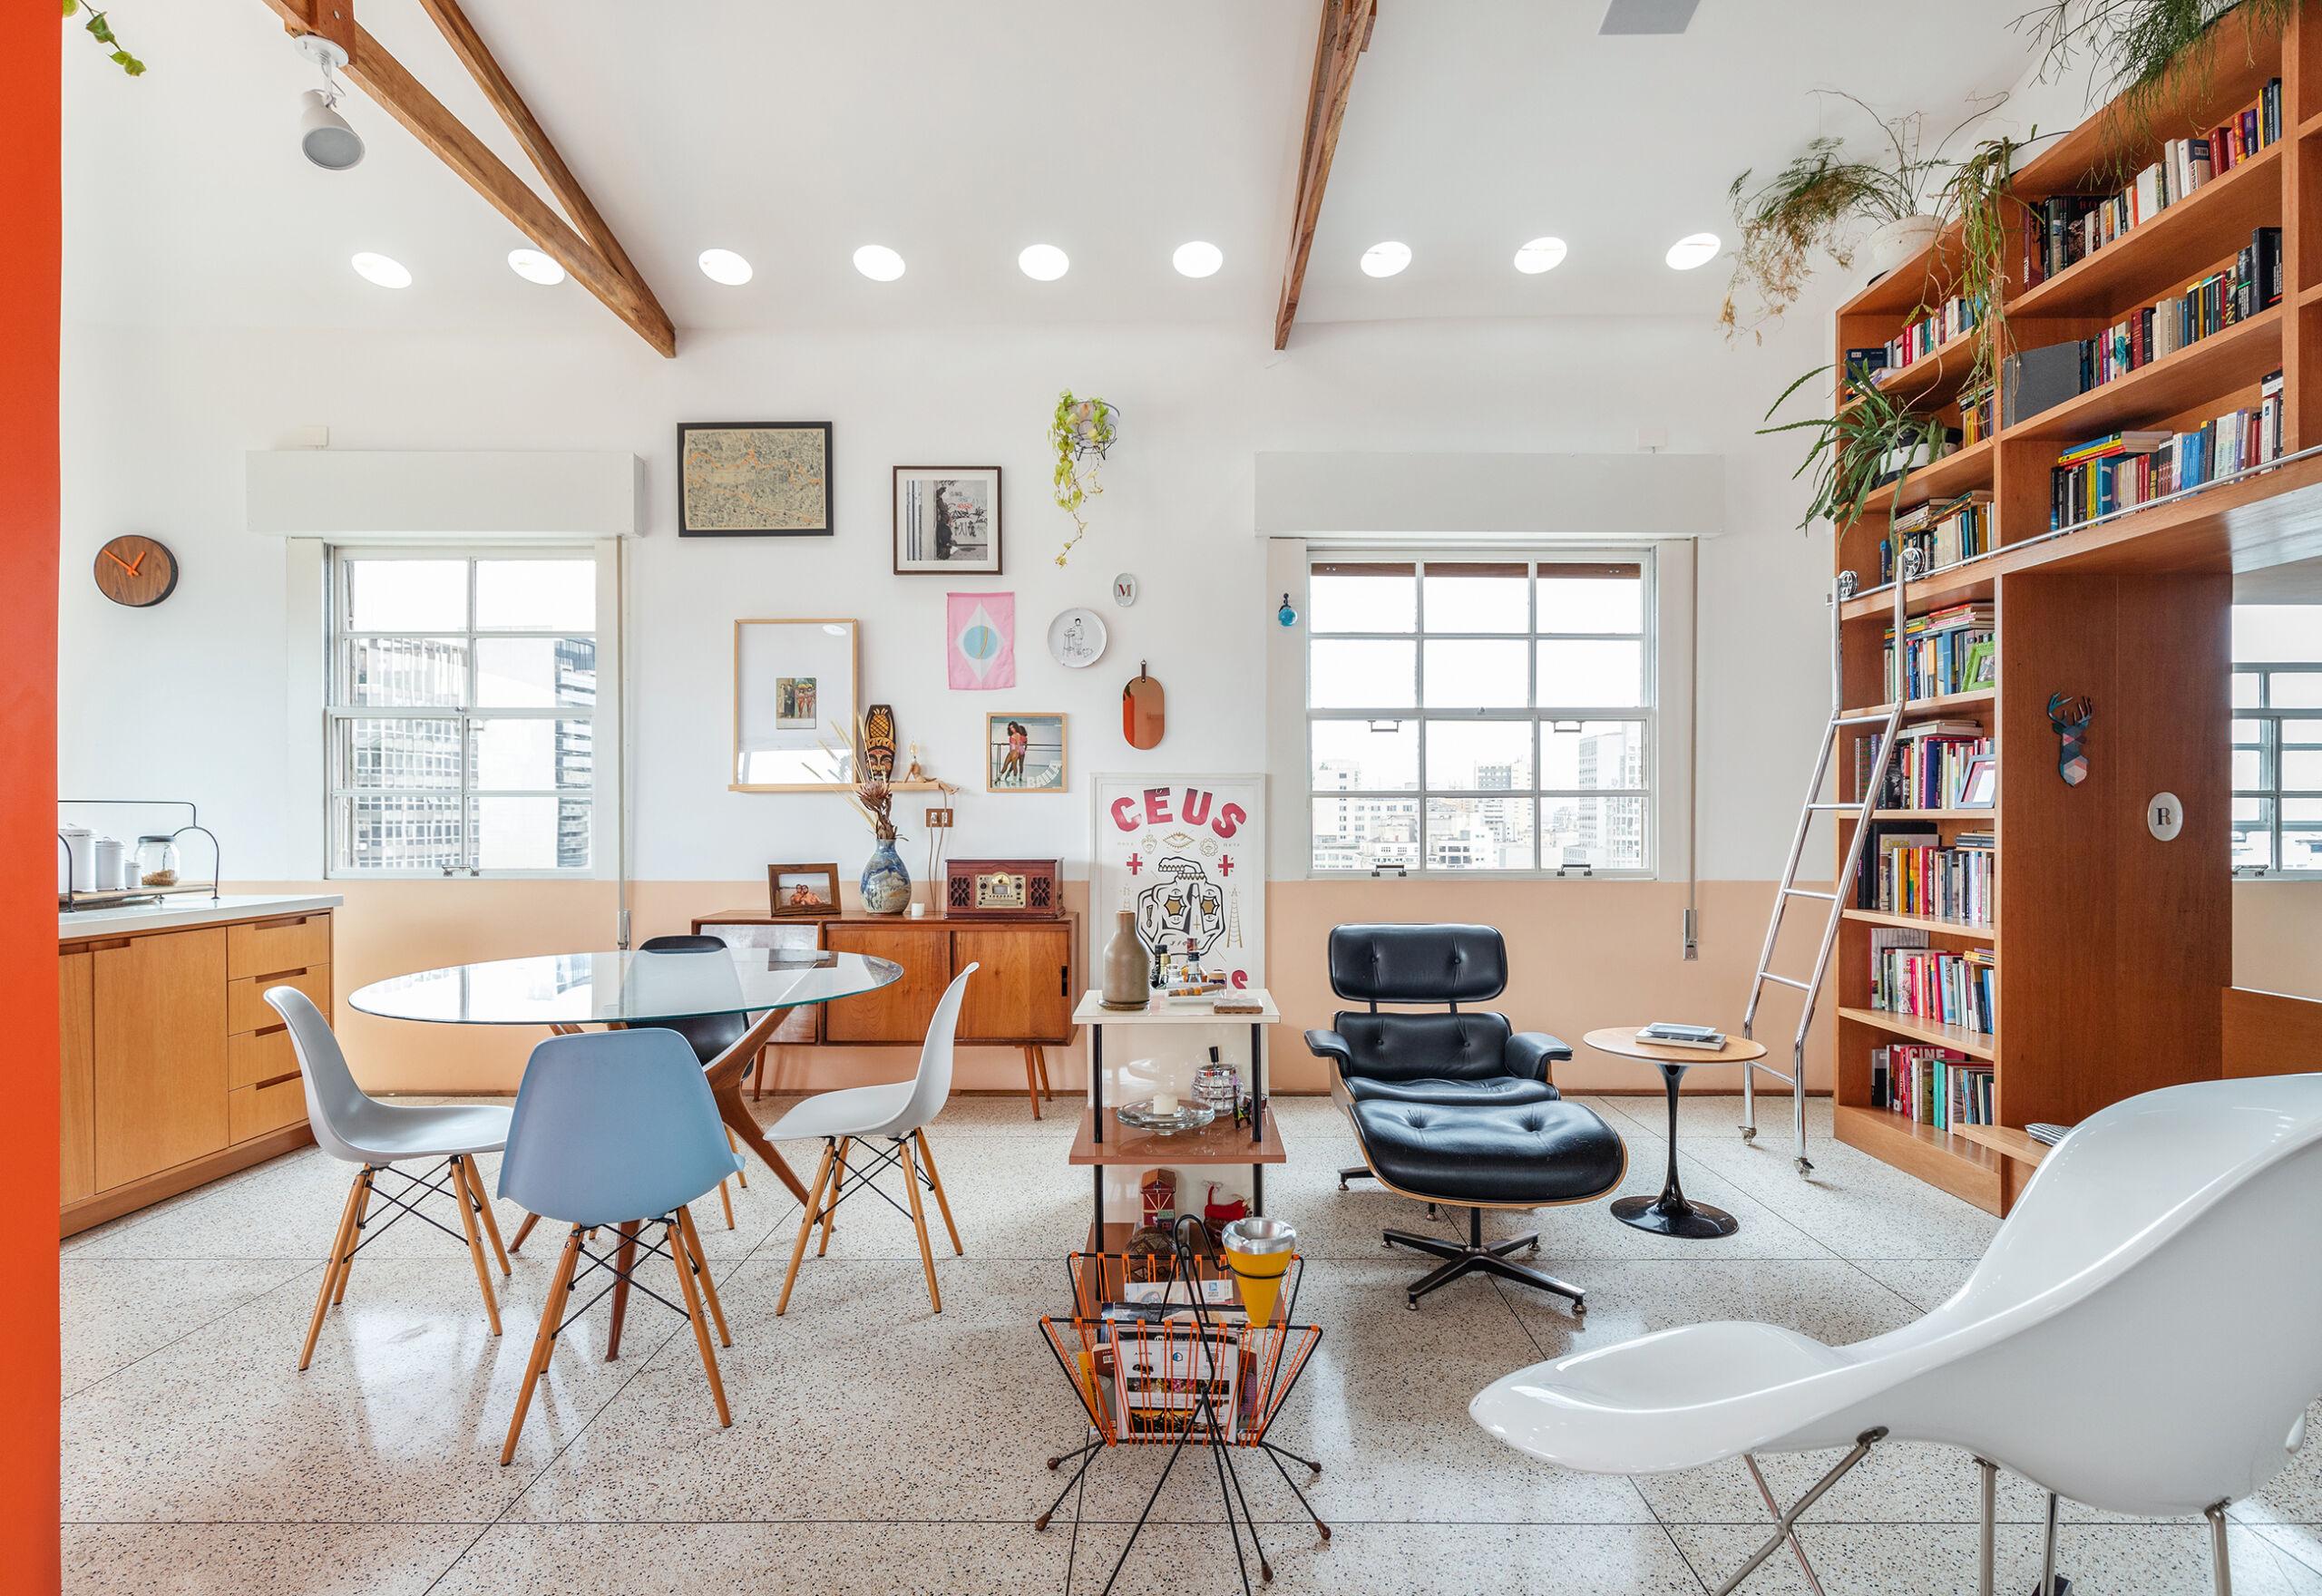 Apartamento iluminado com piso de granilite branco